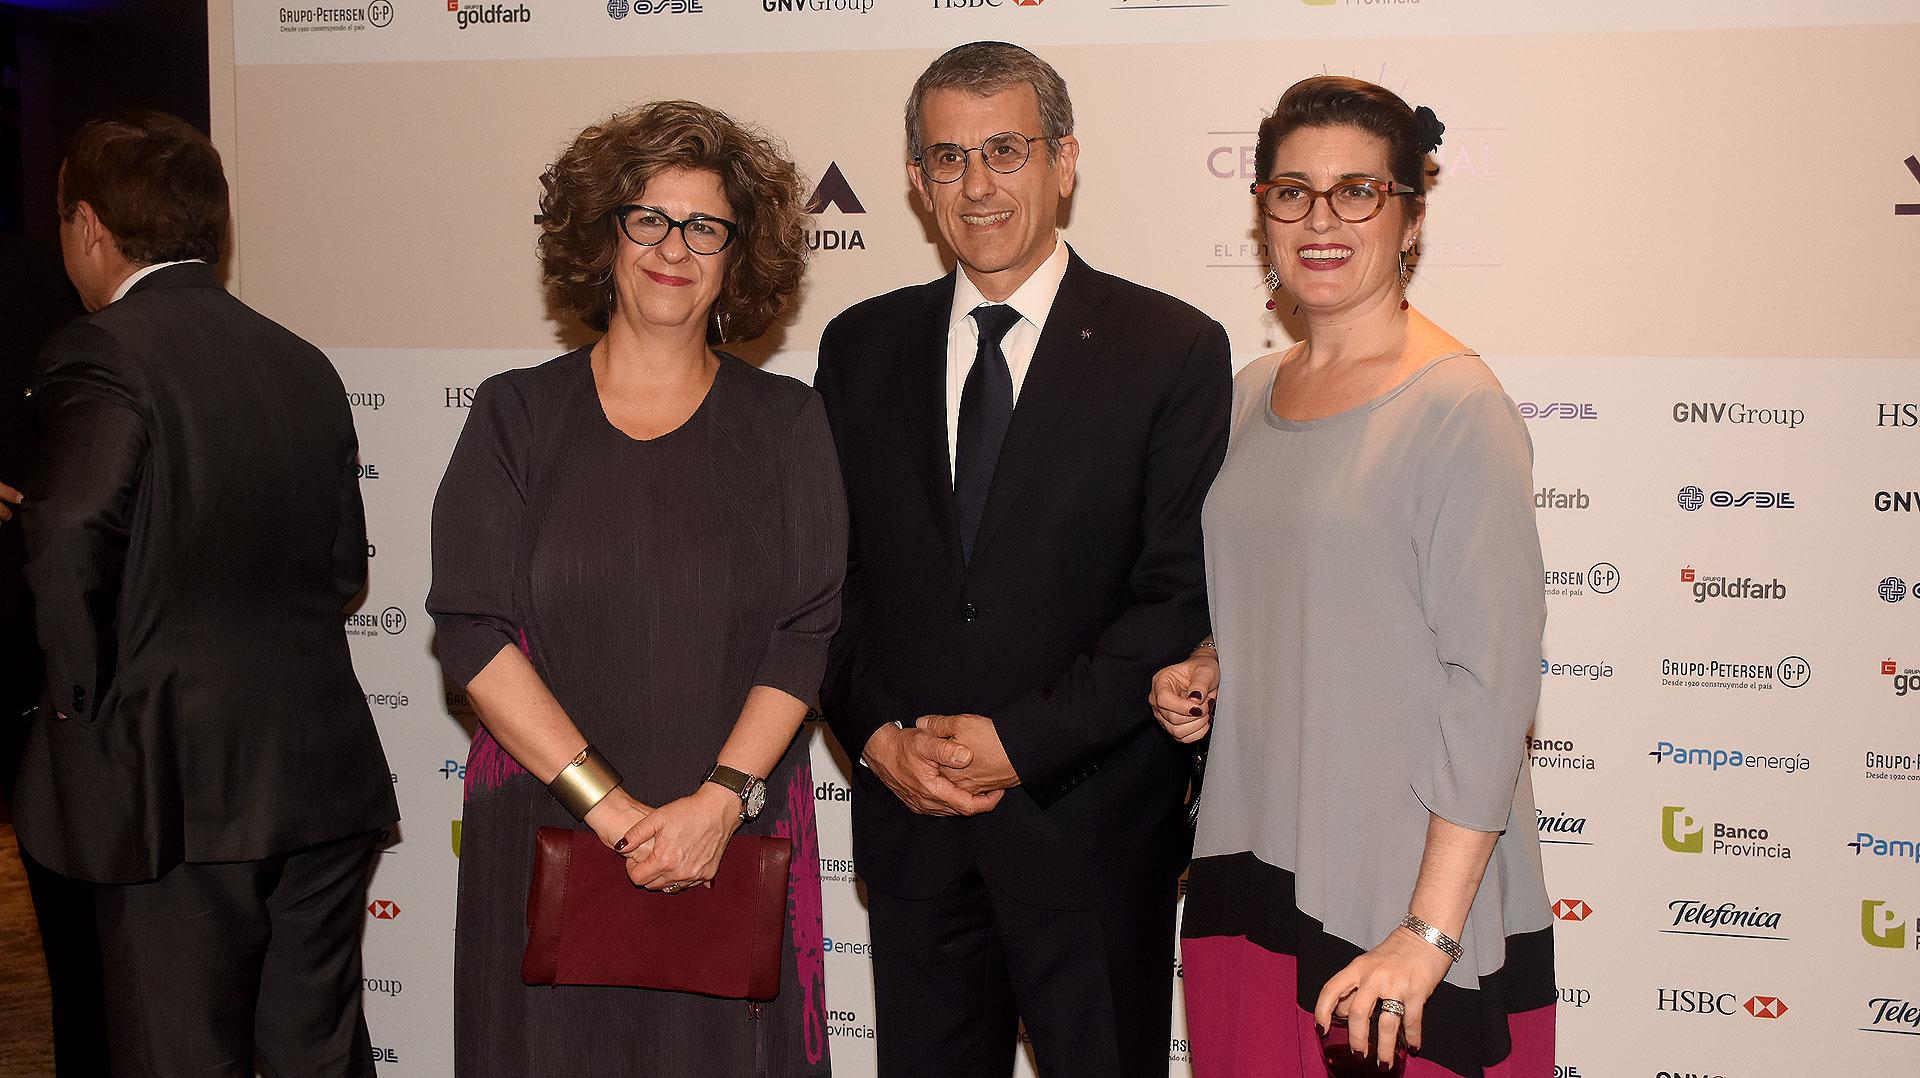 Dina Siegel Vann, directora del American Jewish Committe's (AJC), y Agustín Zbar